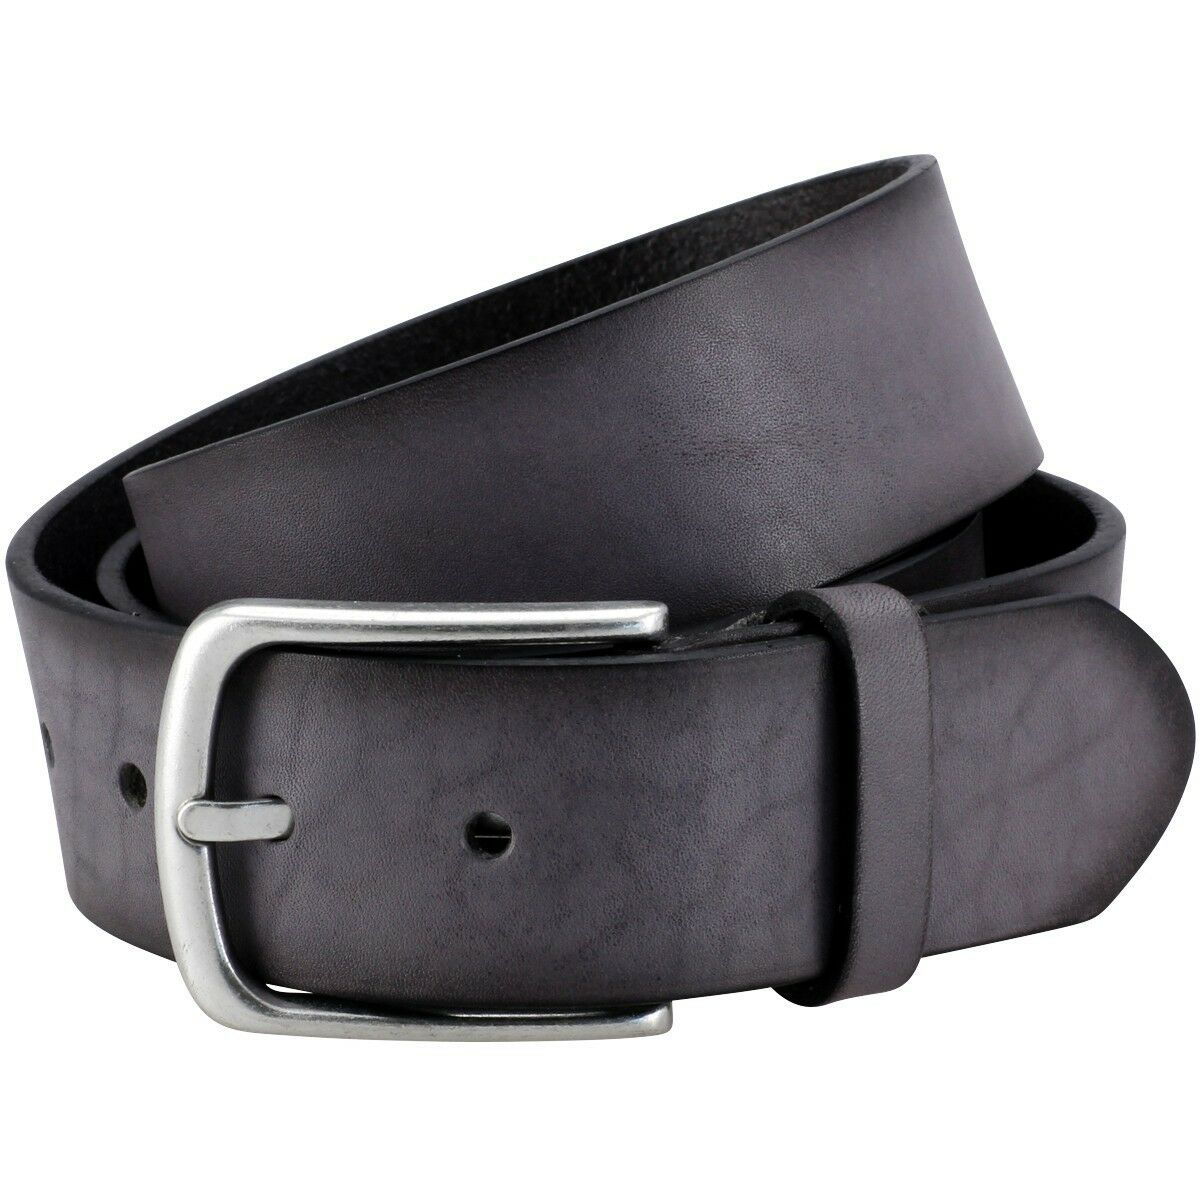 Ledergürtel Herren   Gürtel Damen The Art of Belt by LINDENMANN unisex, grau, 90 | Online Shop Europe  | Erste in seiner Klasse